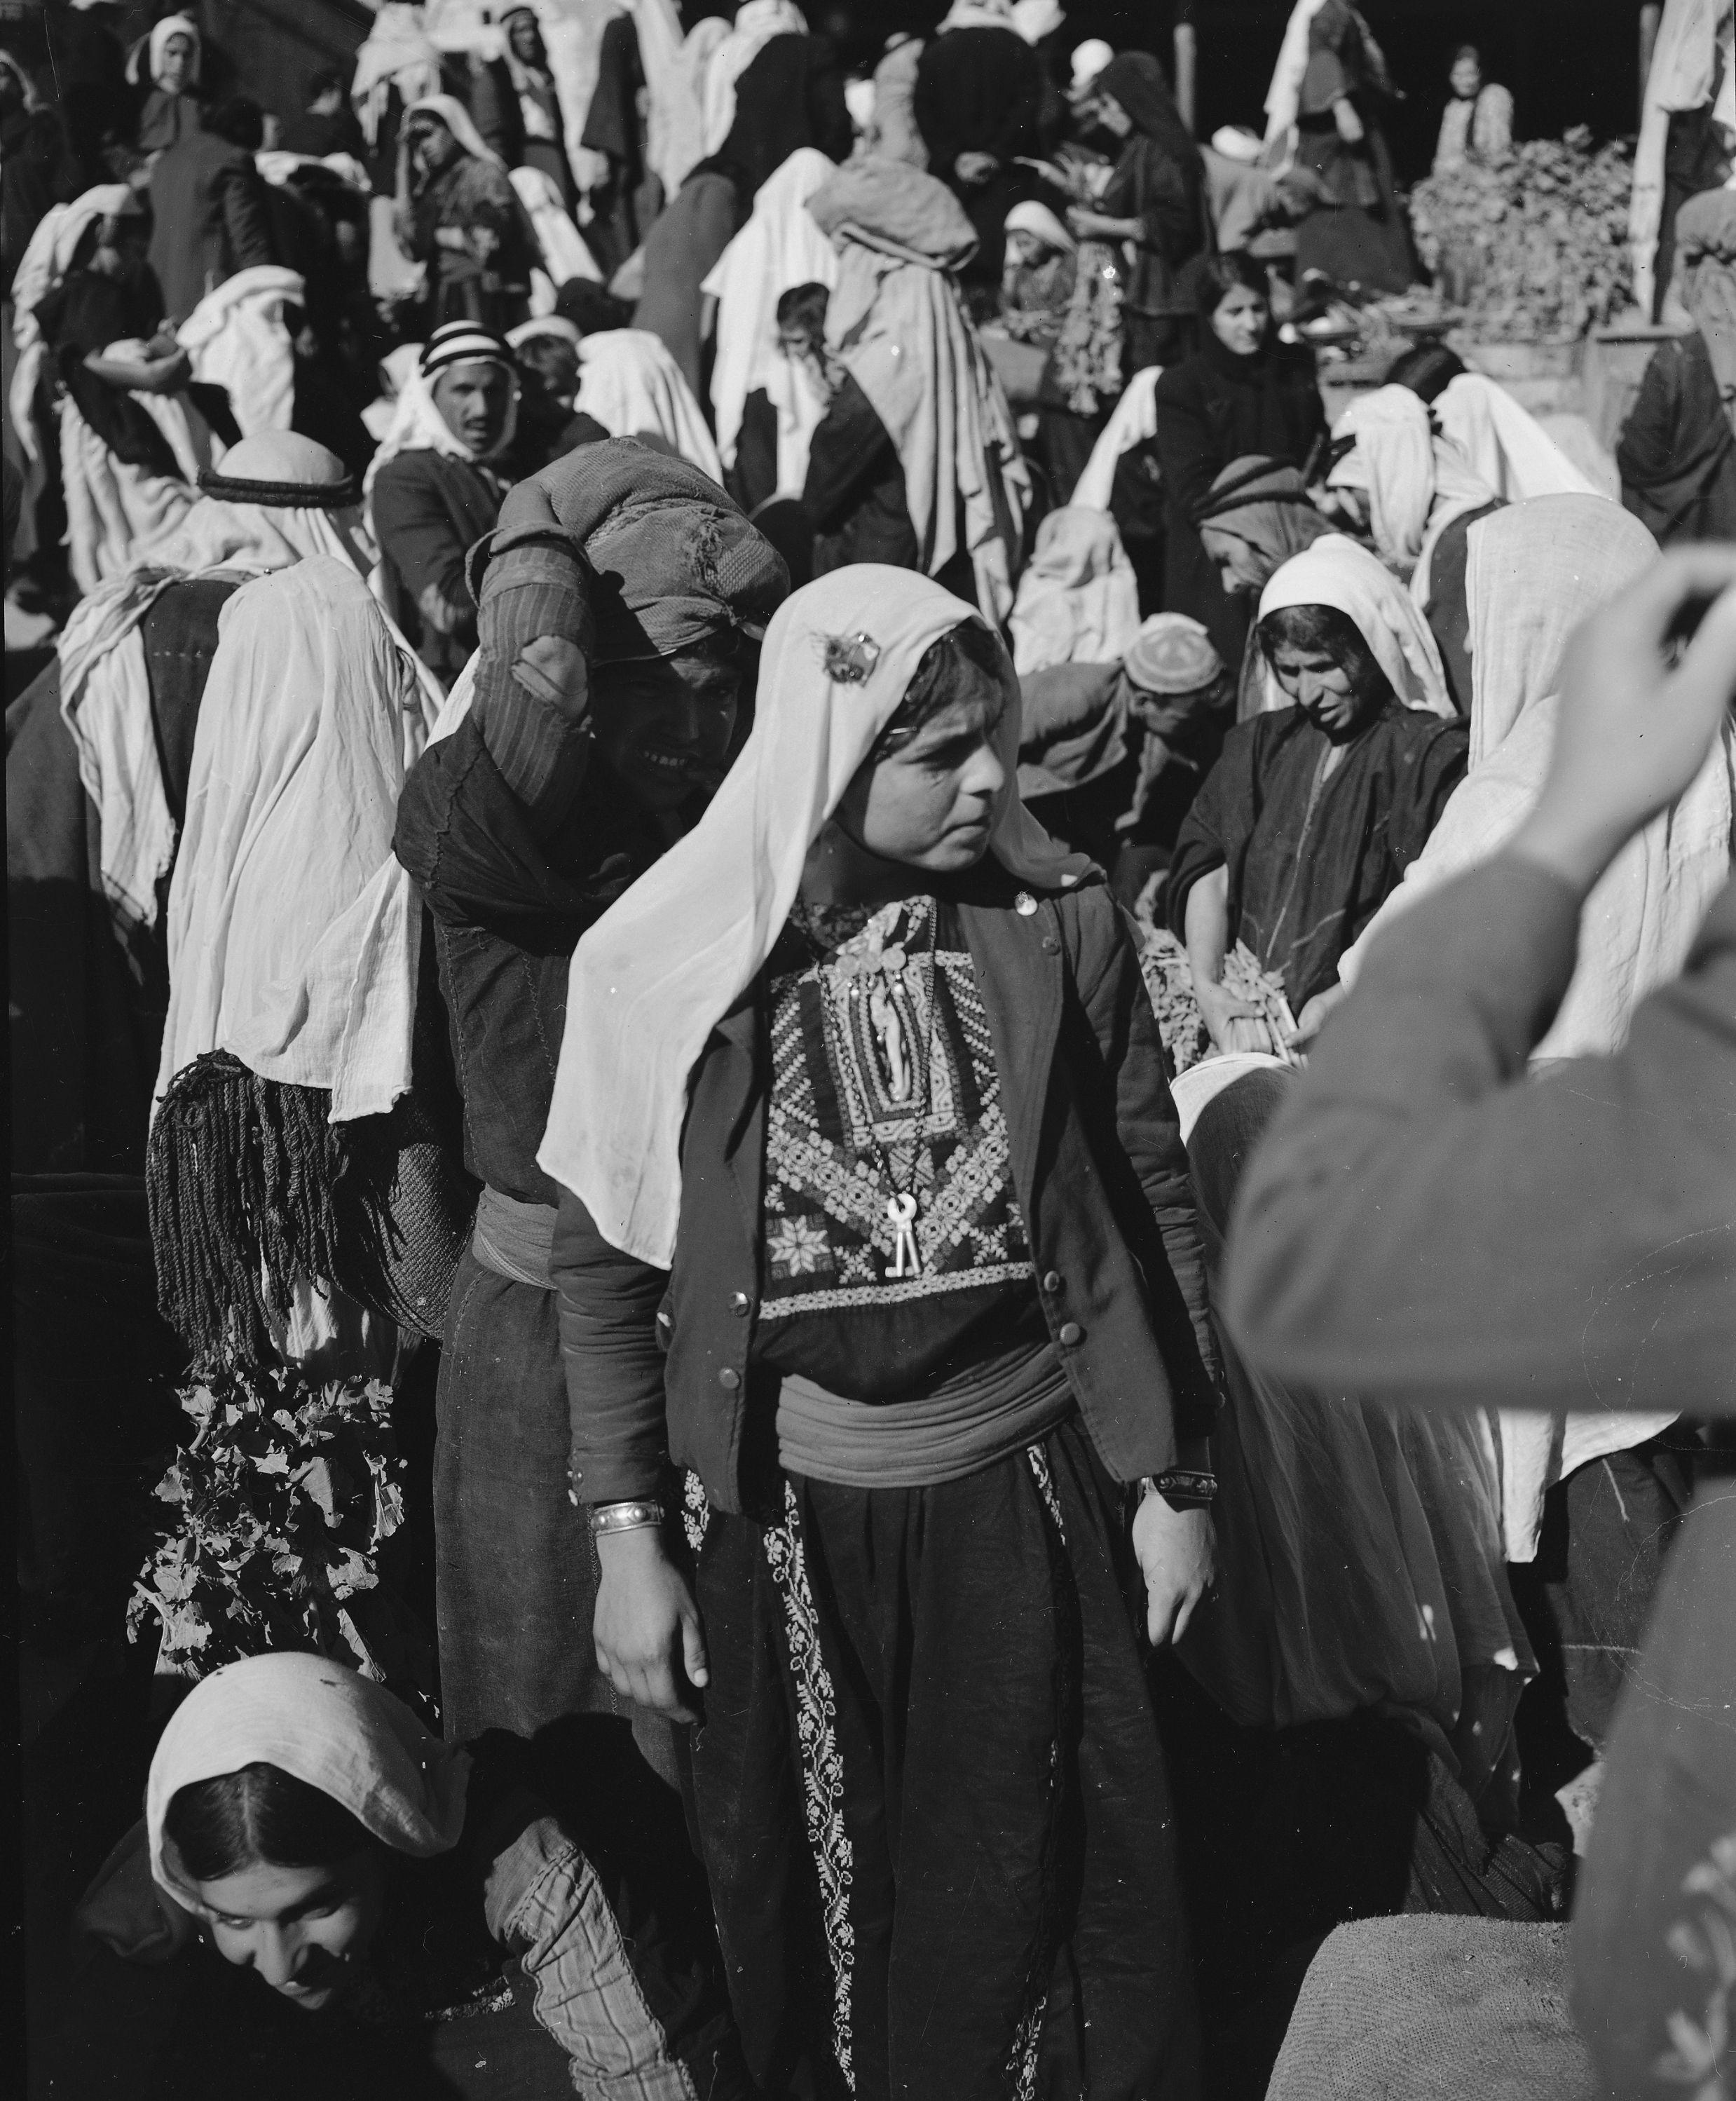 Arab Girls Shop In The Market Place Near Manger Square In Bethlehem Nov 28 1947 Ap Photo Jim Pringle Ref Pa Palestine Palestine History Israel History